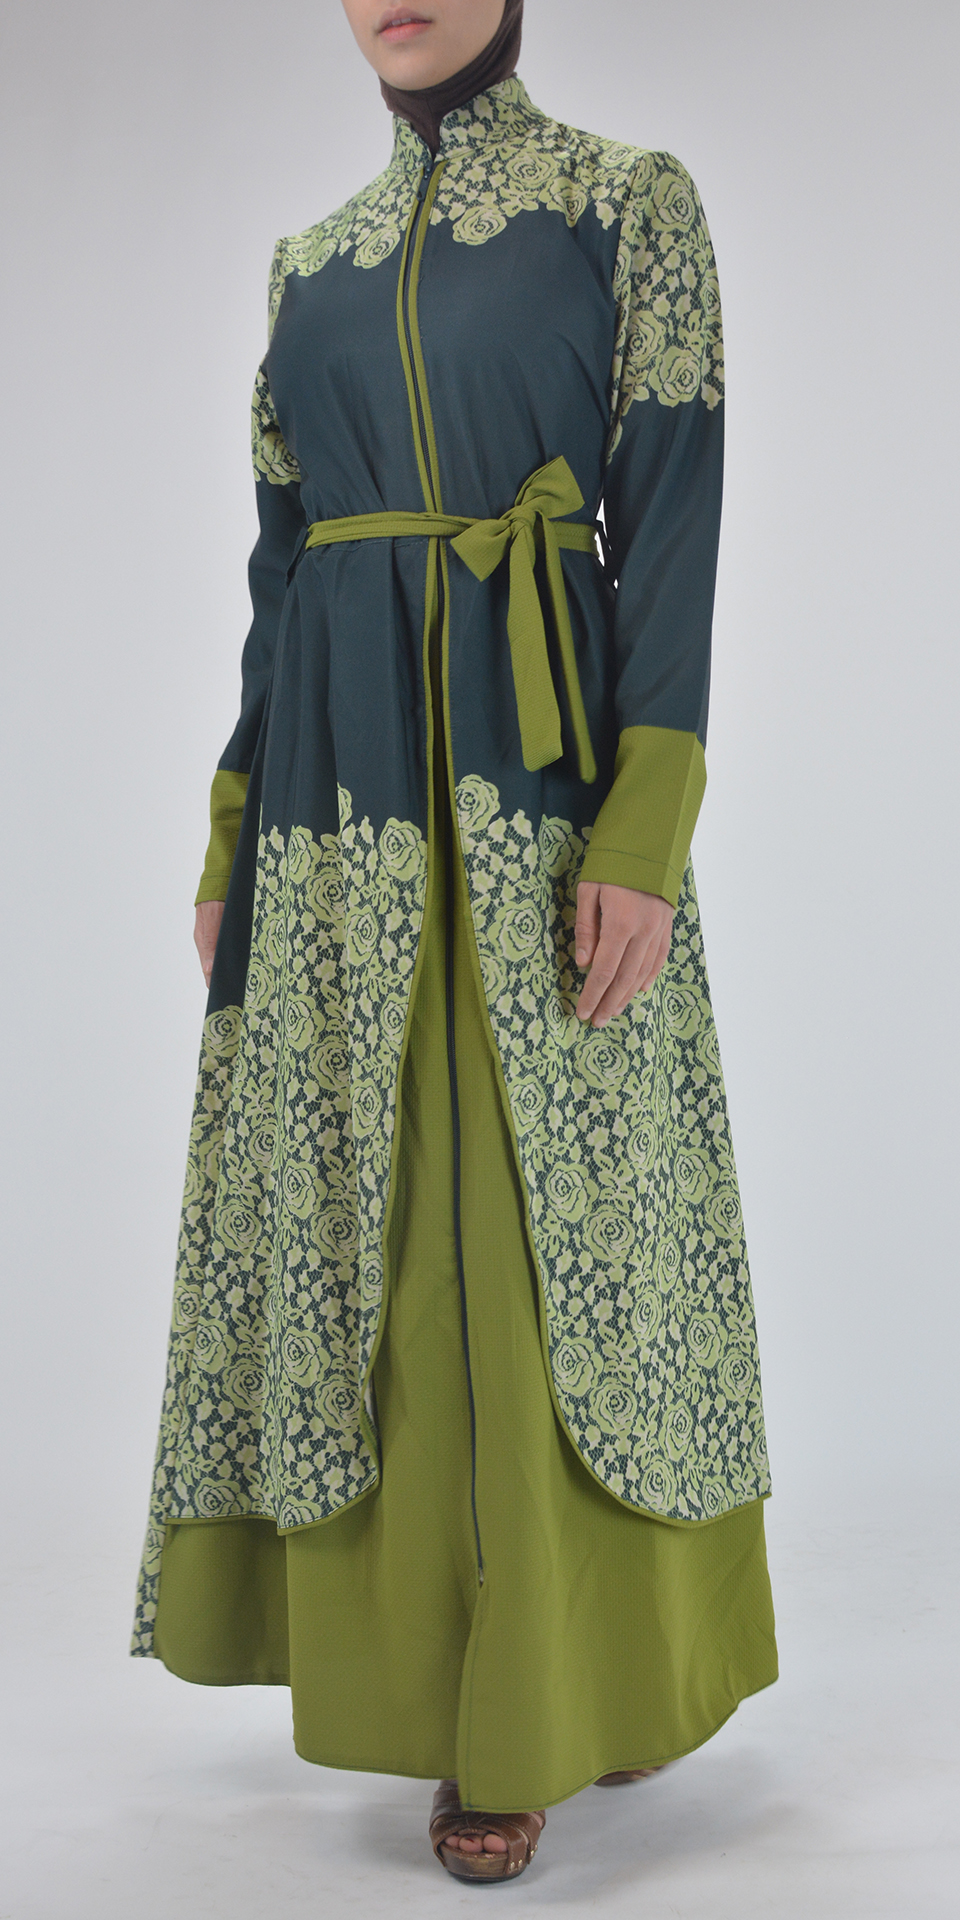 Sabra Spring Bloom Abaya - Full Length Zipper ab688